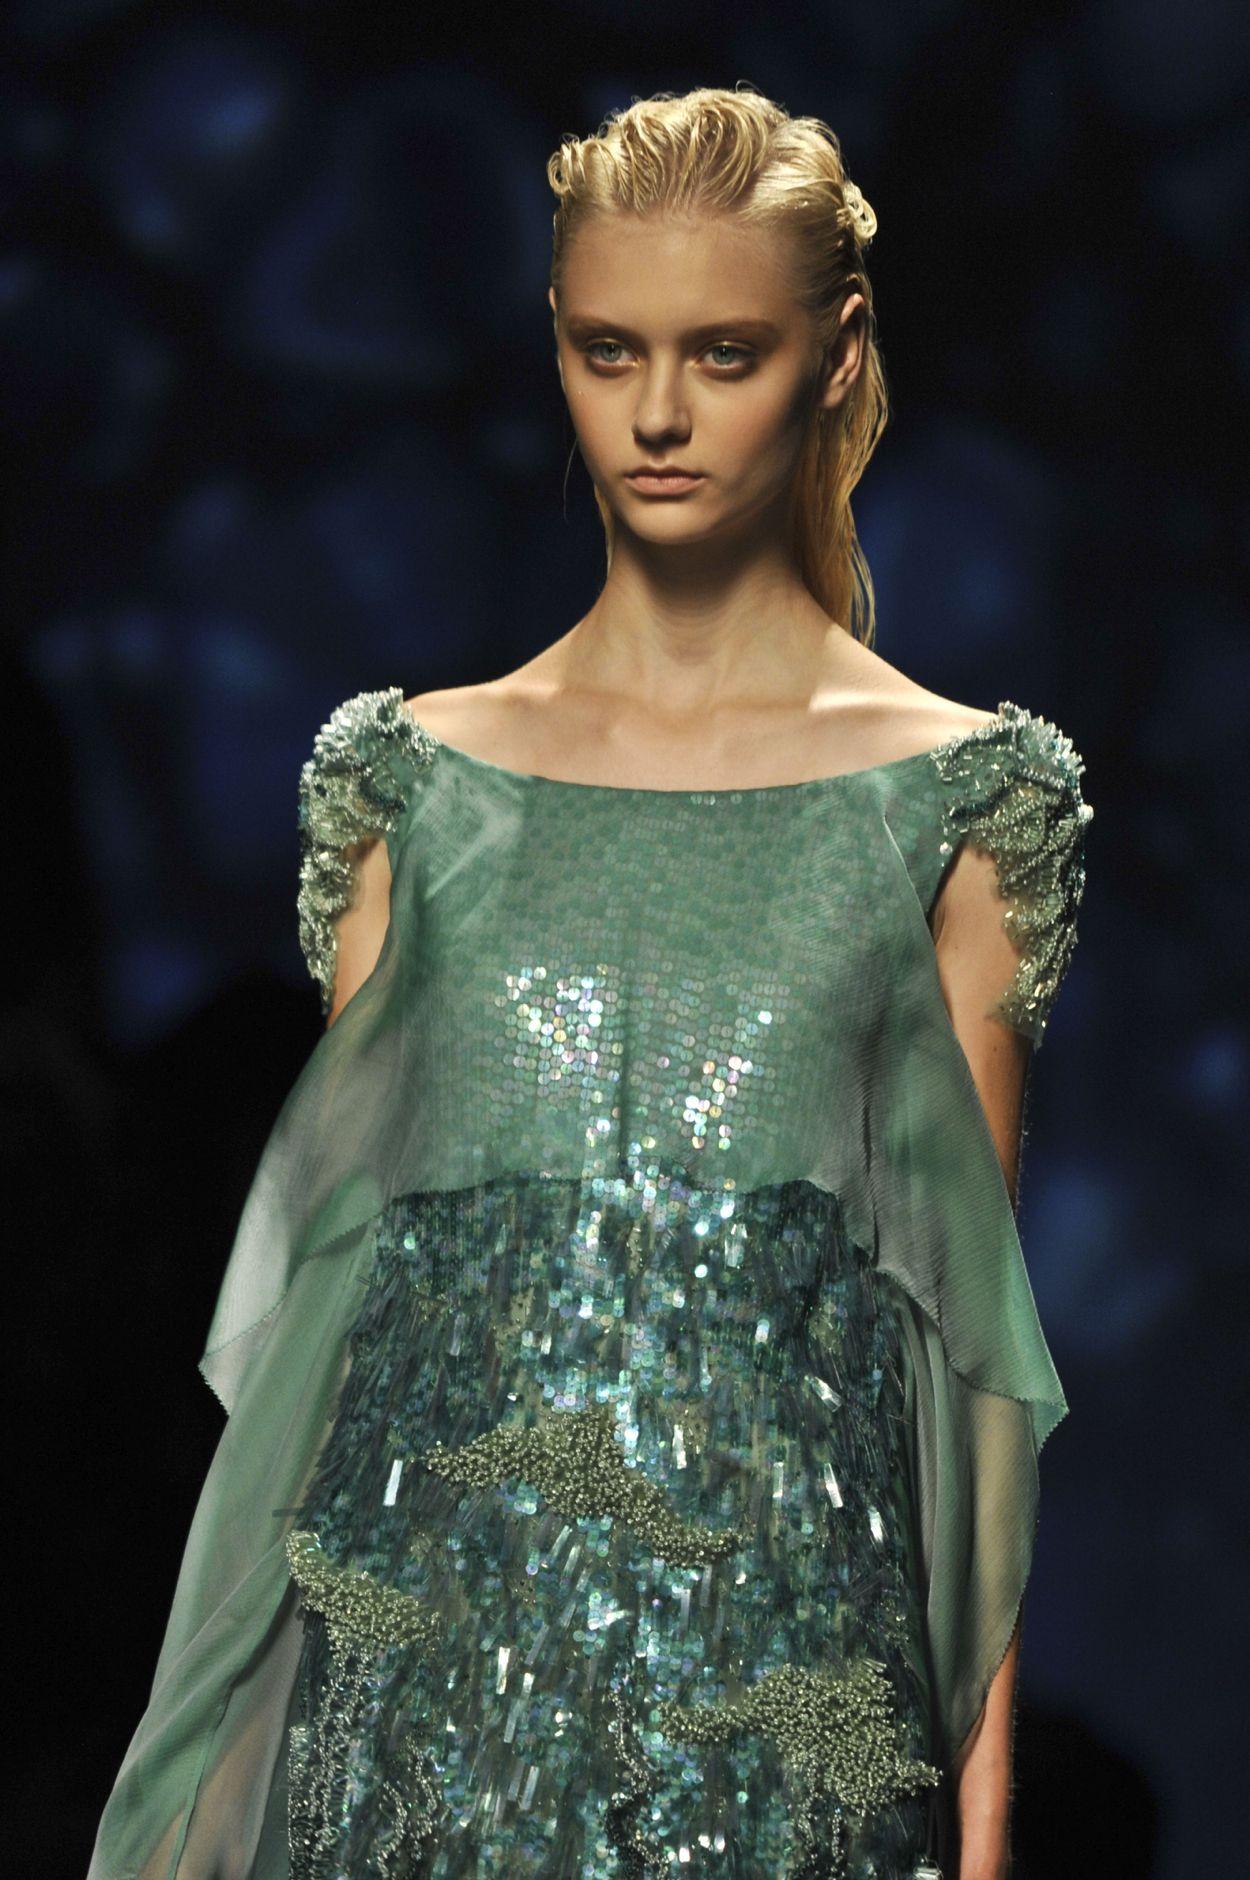 Alberta Ferretti Summer 2013 Collection Milan Fashion Week